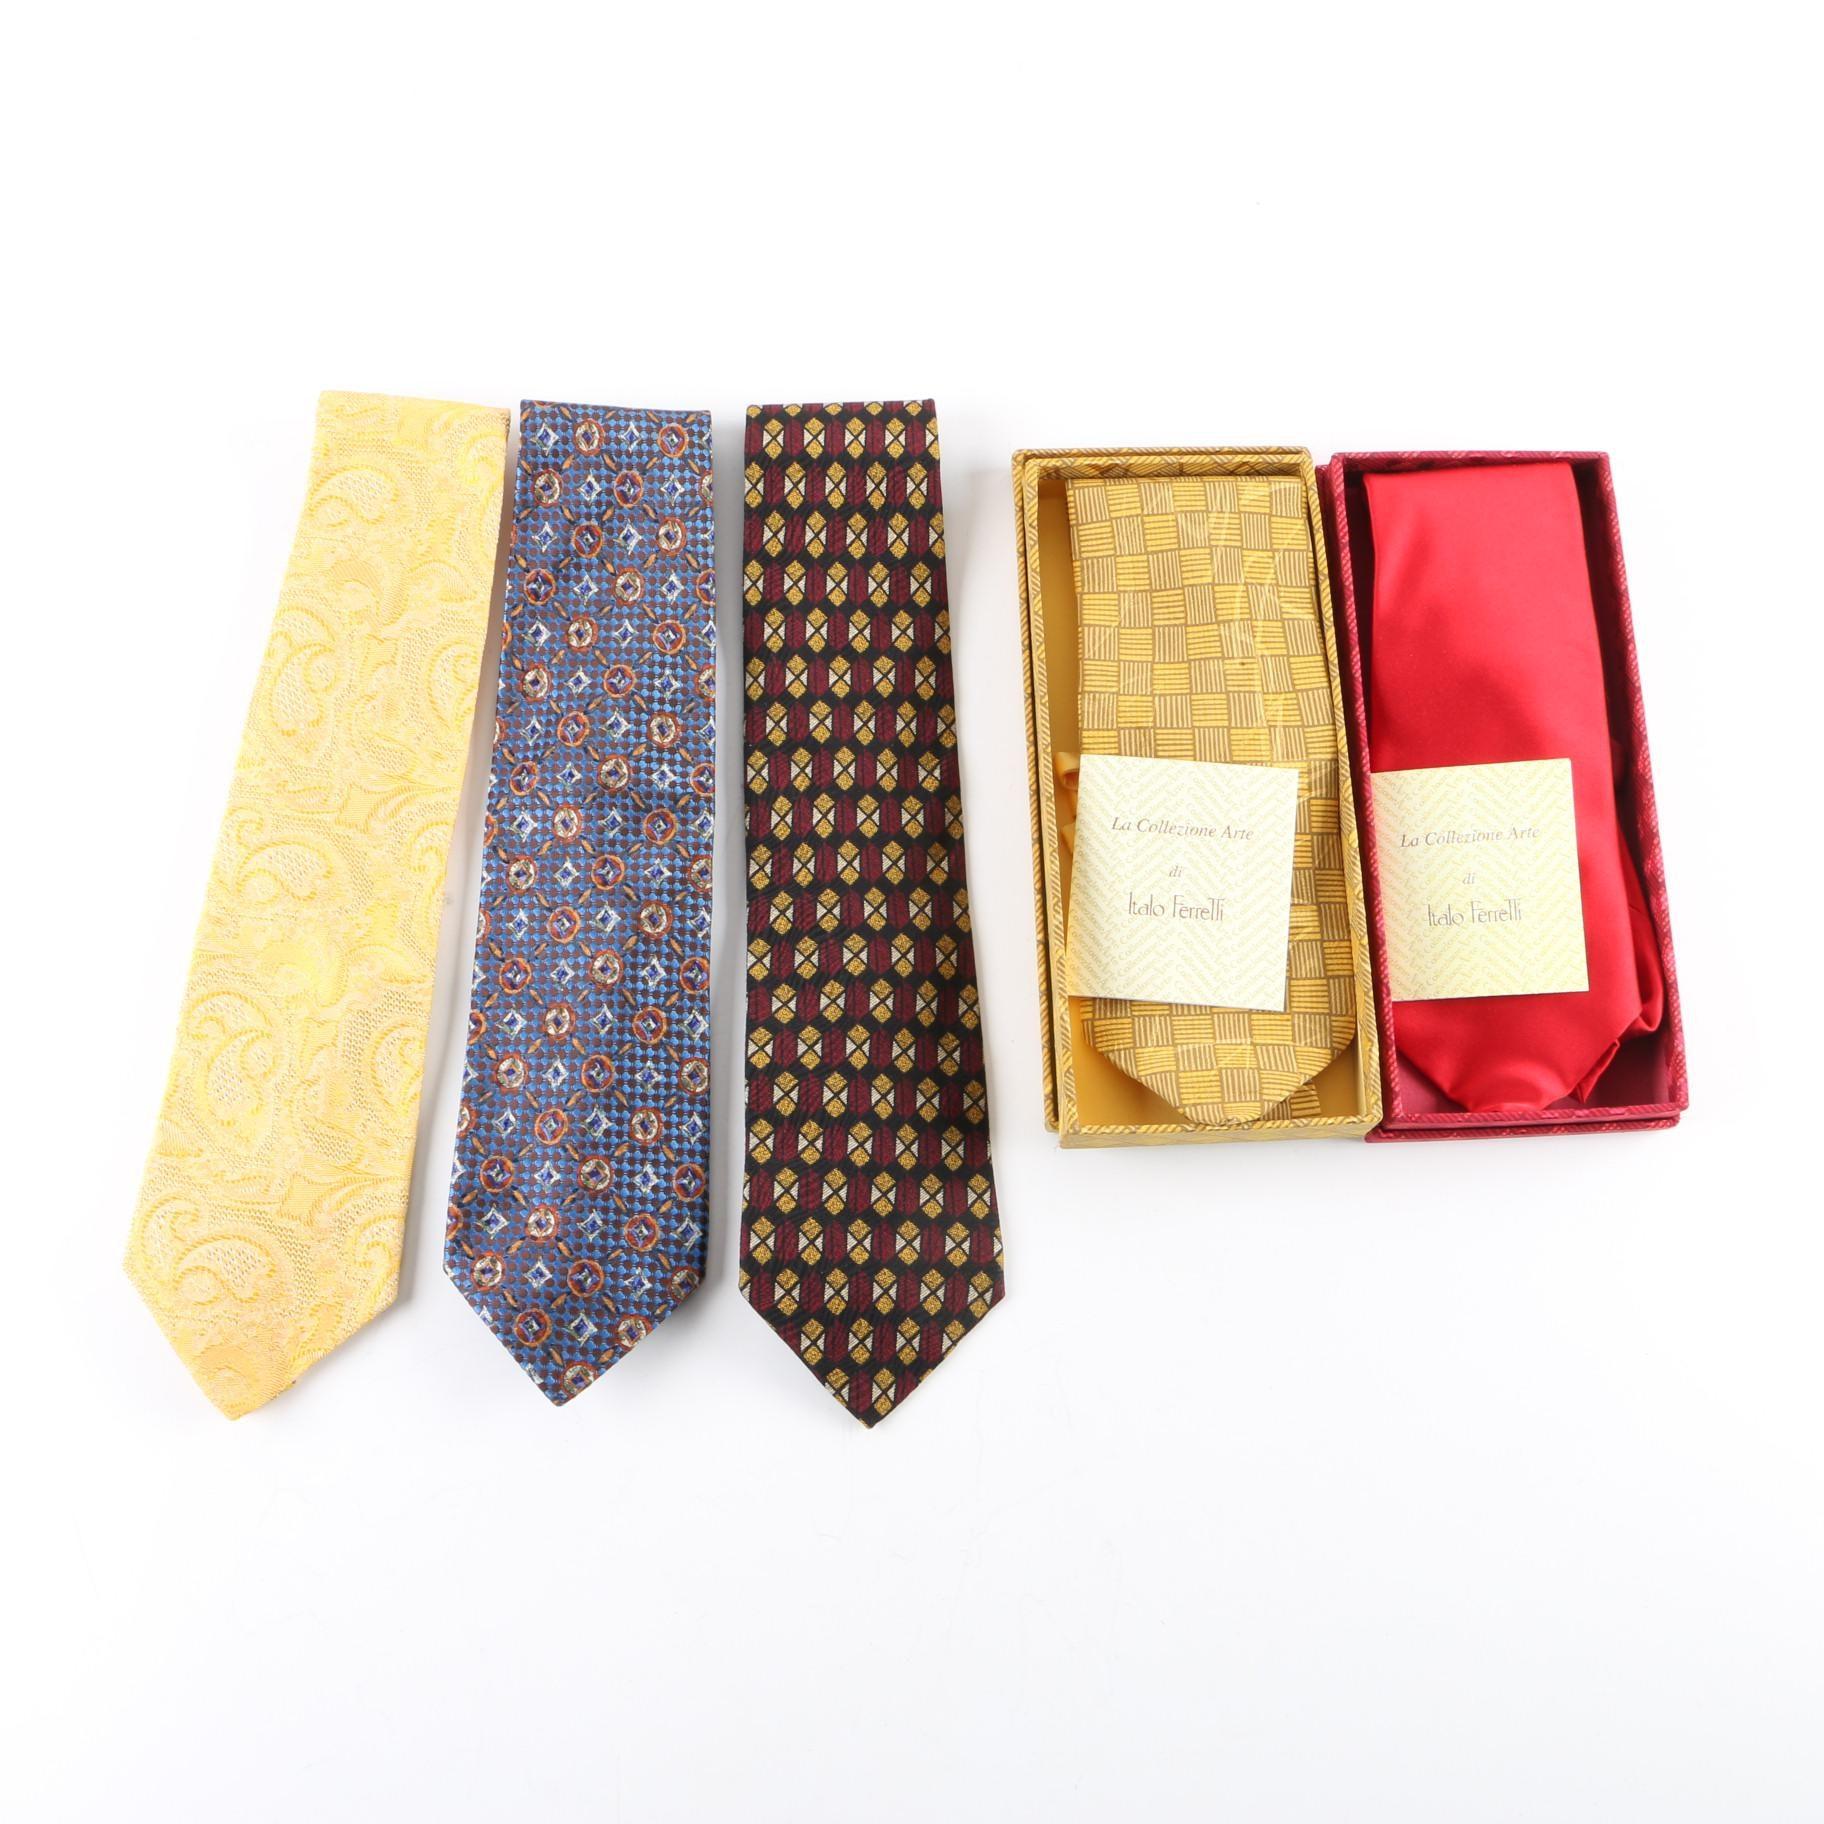 Men's Ermenegildo Zegna, Italo Ferretti and Donald J. Trump Silk Neckties